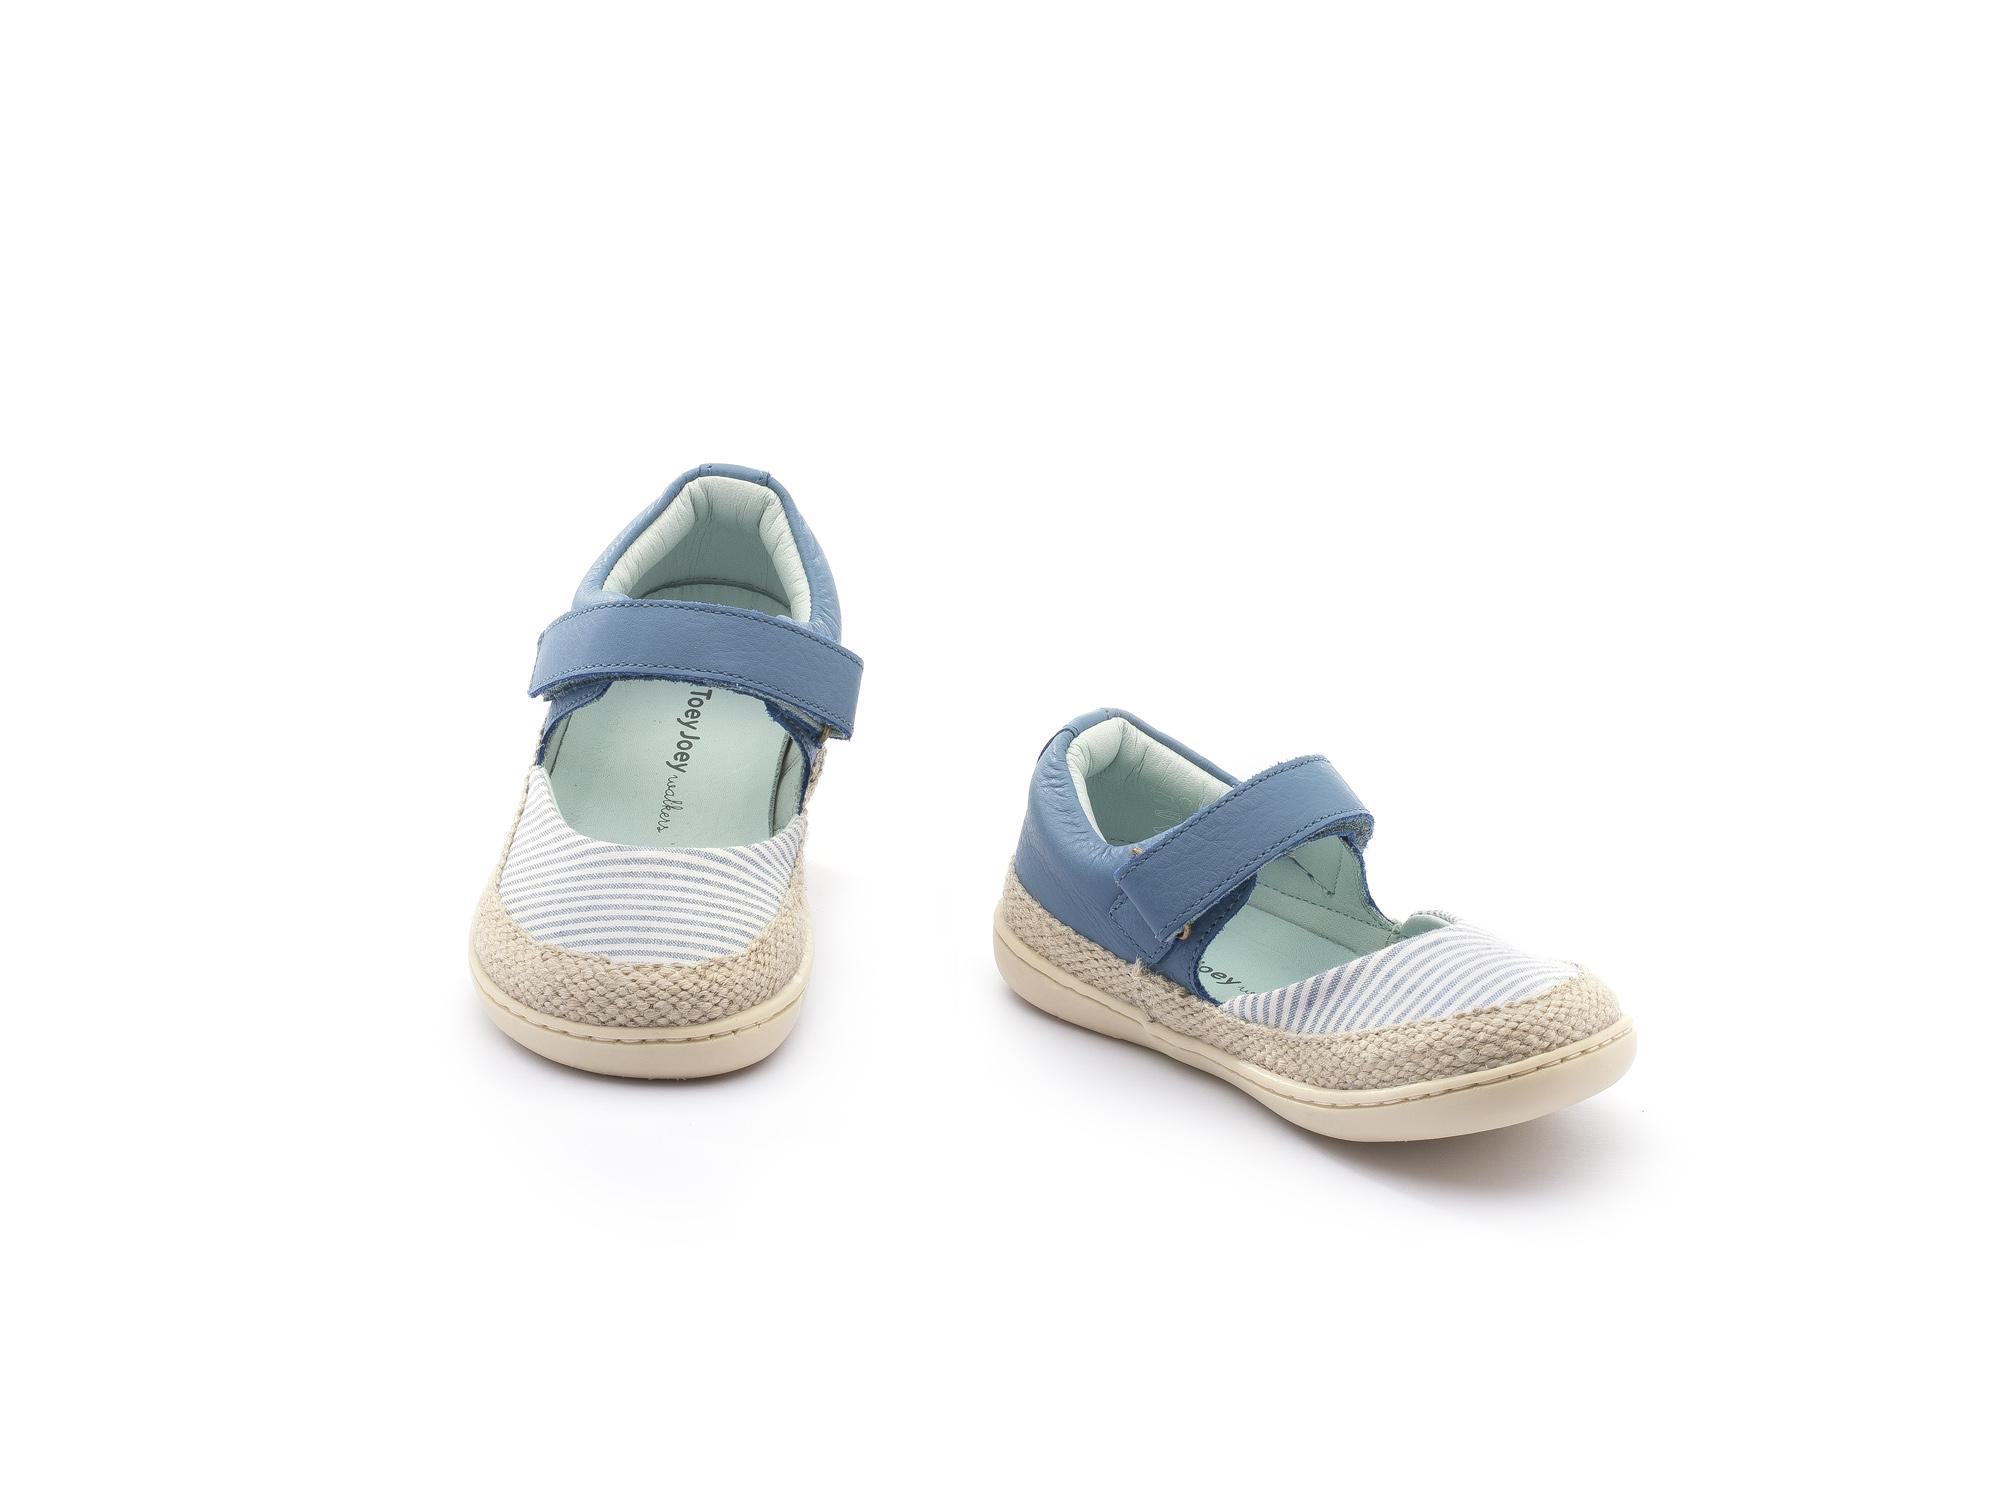 Boneca Little Seaside Light Navy Stripe Canvas/ Denim Toddler 2 à 4 anos - 2